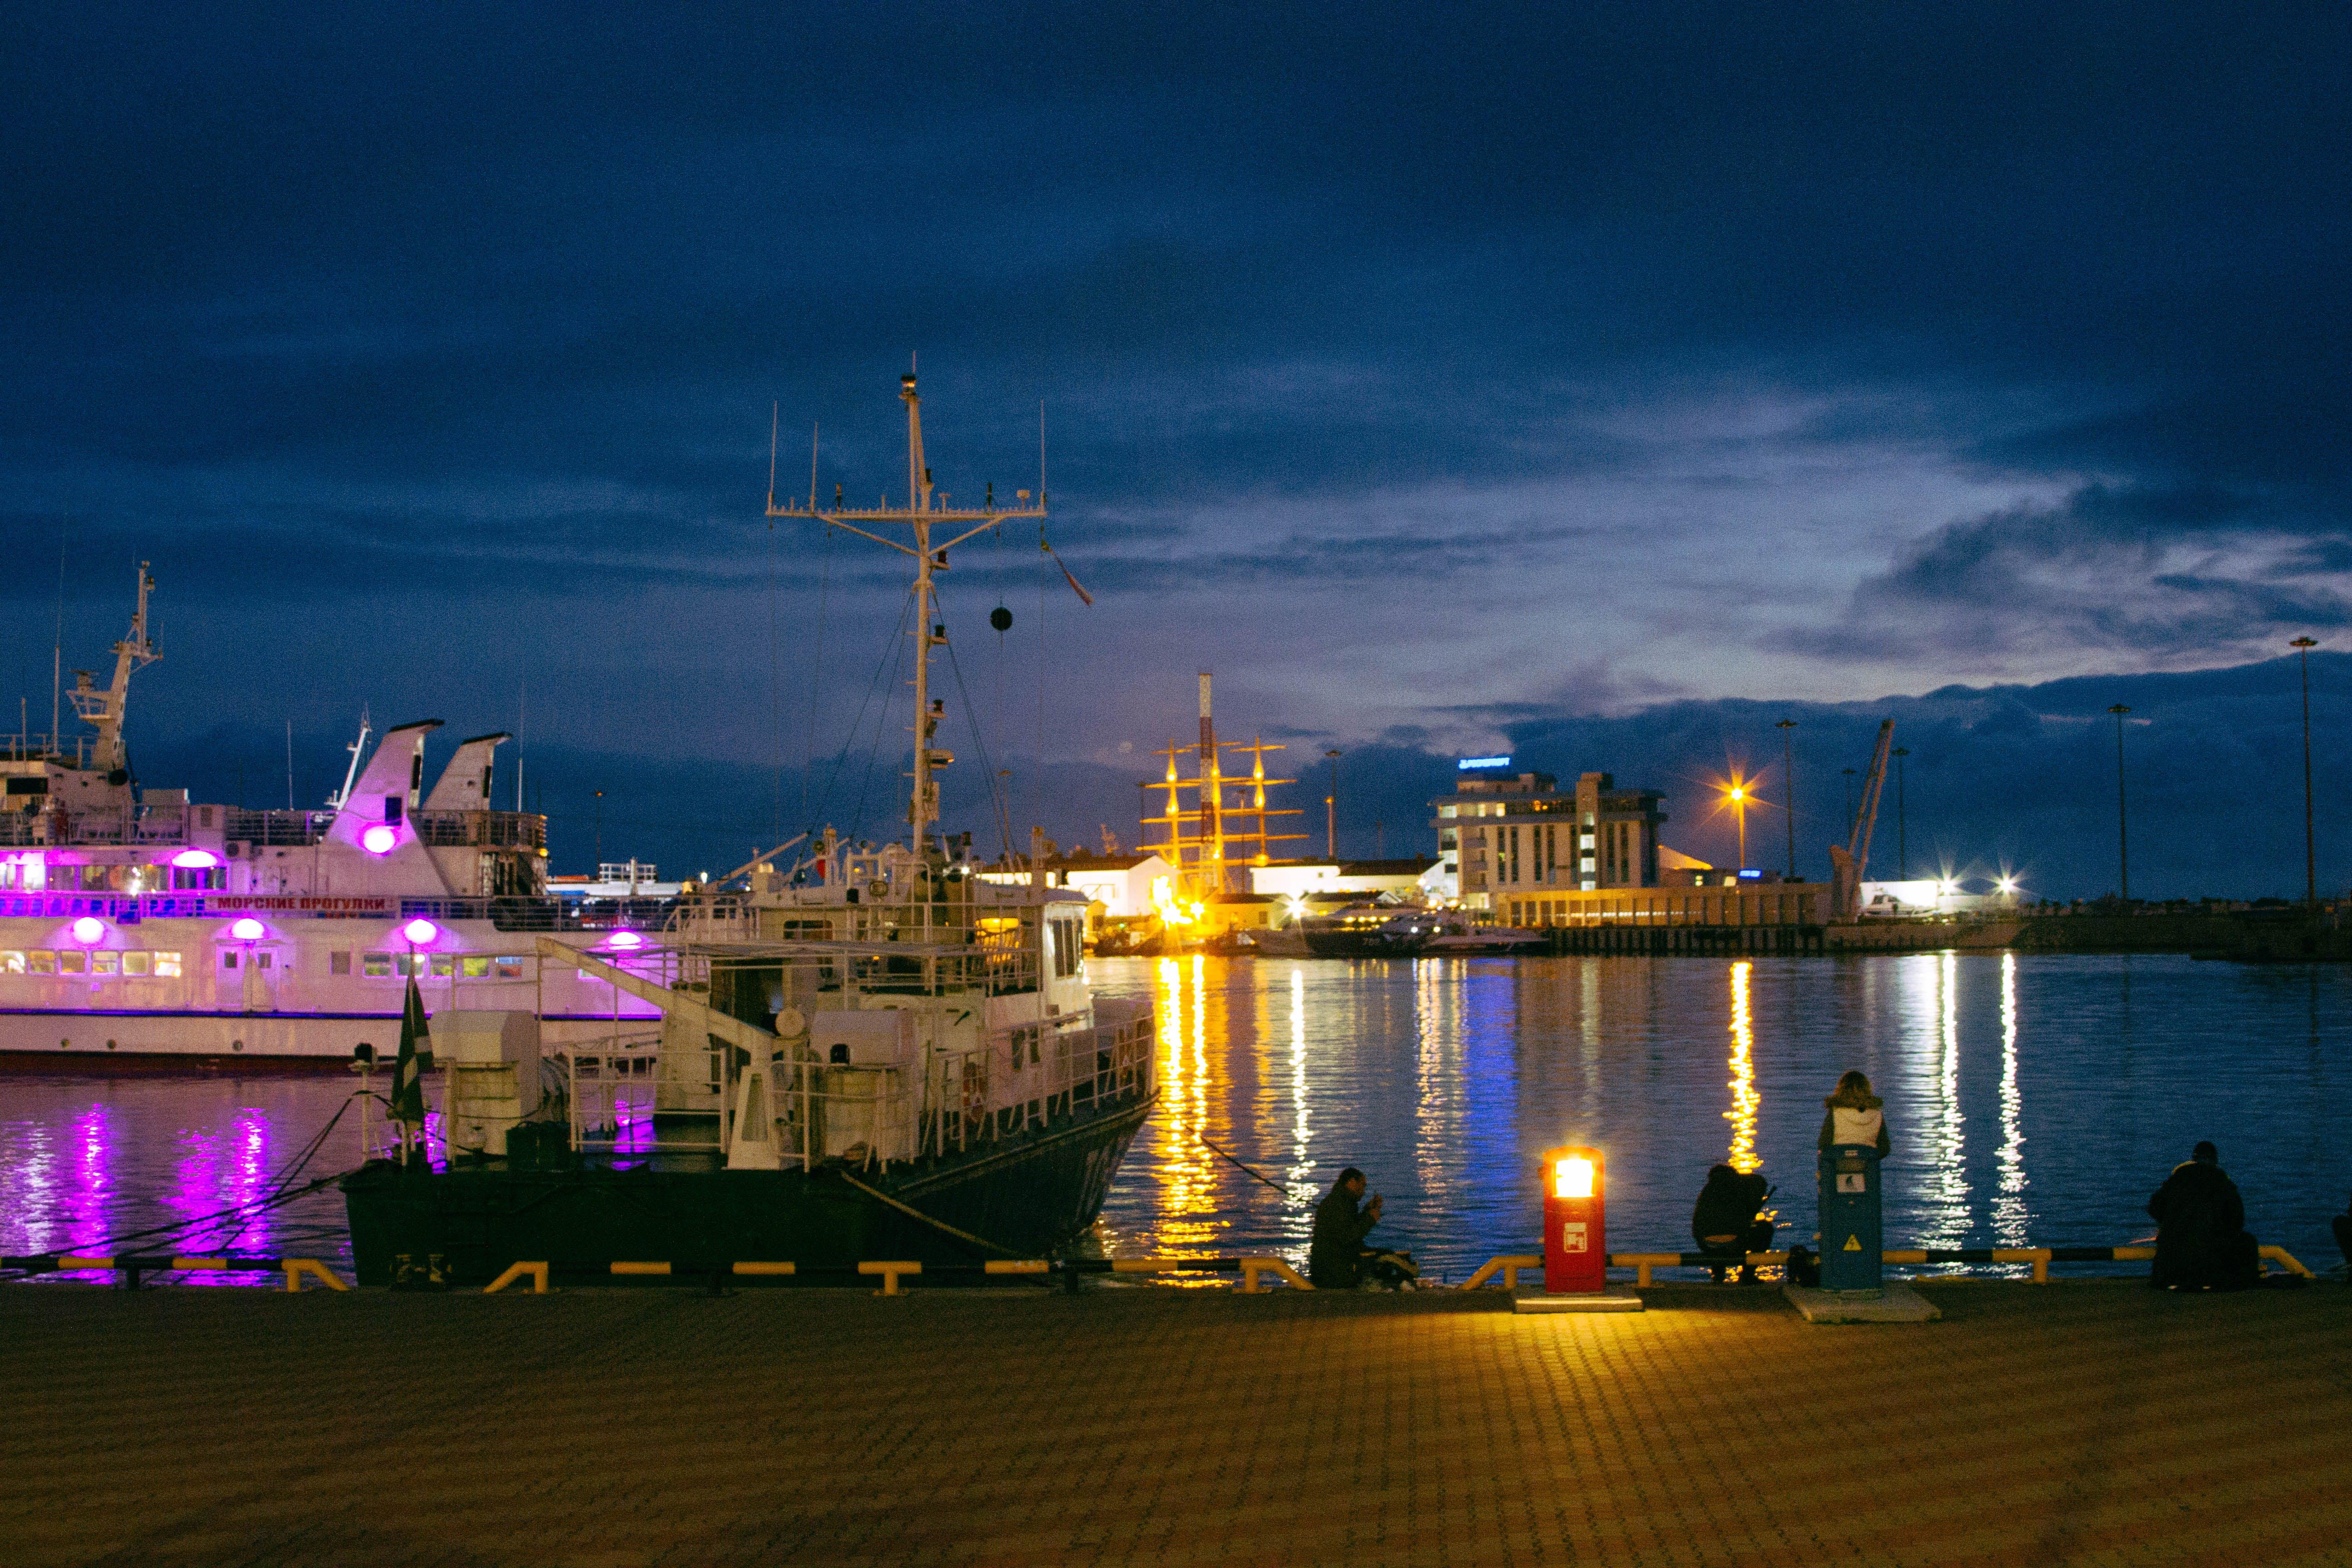 White Boat Near Dock during Nighttime